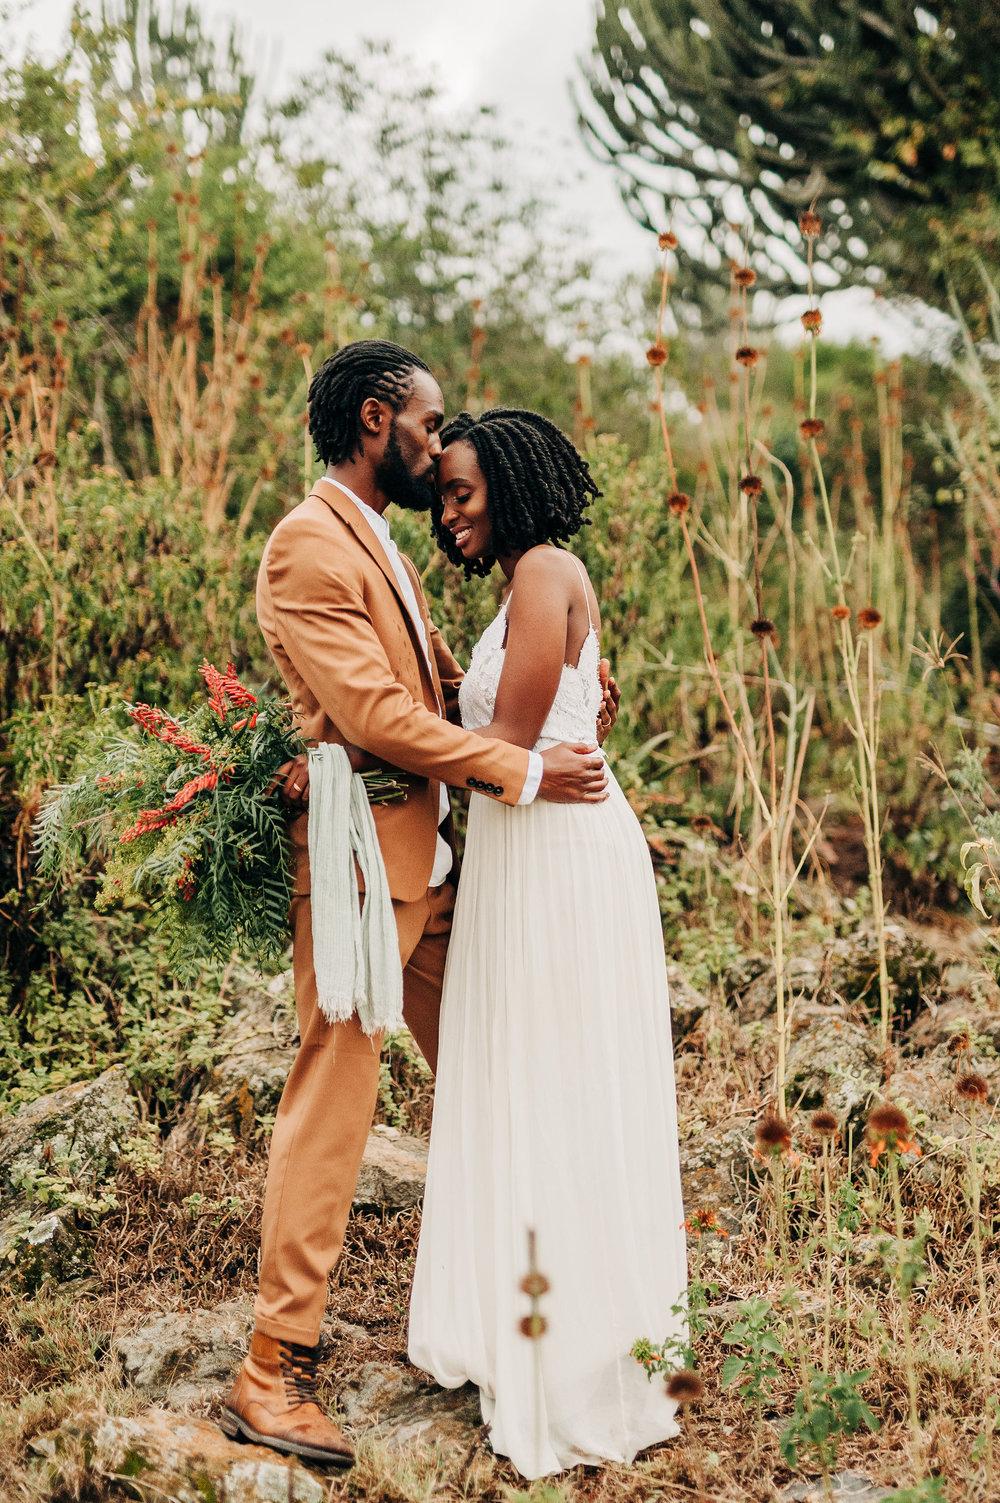 Anna-Hari-Photography-Destination-Wedding-Photographer-Kenya-233.jpg